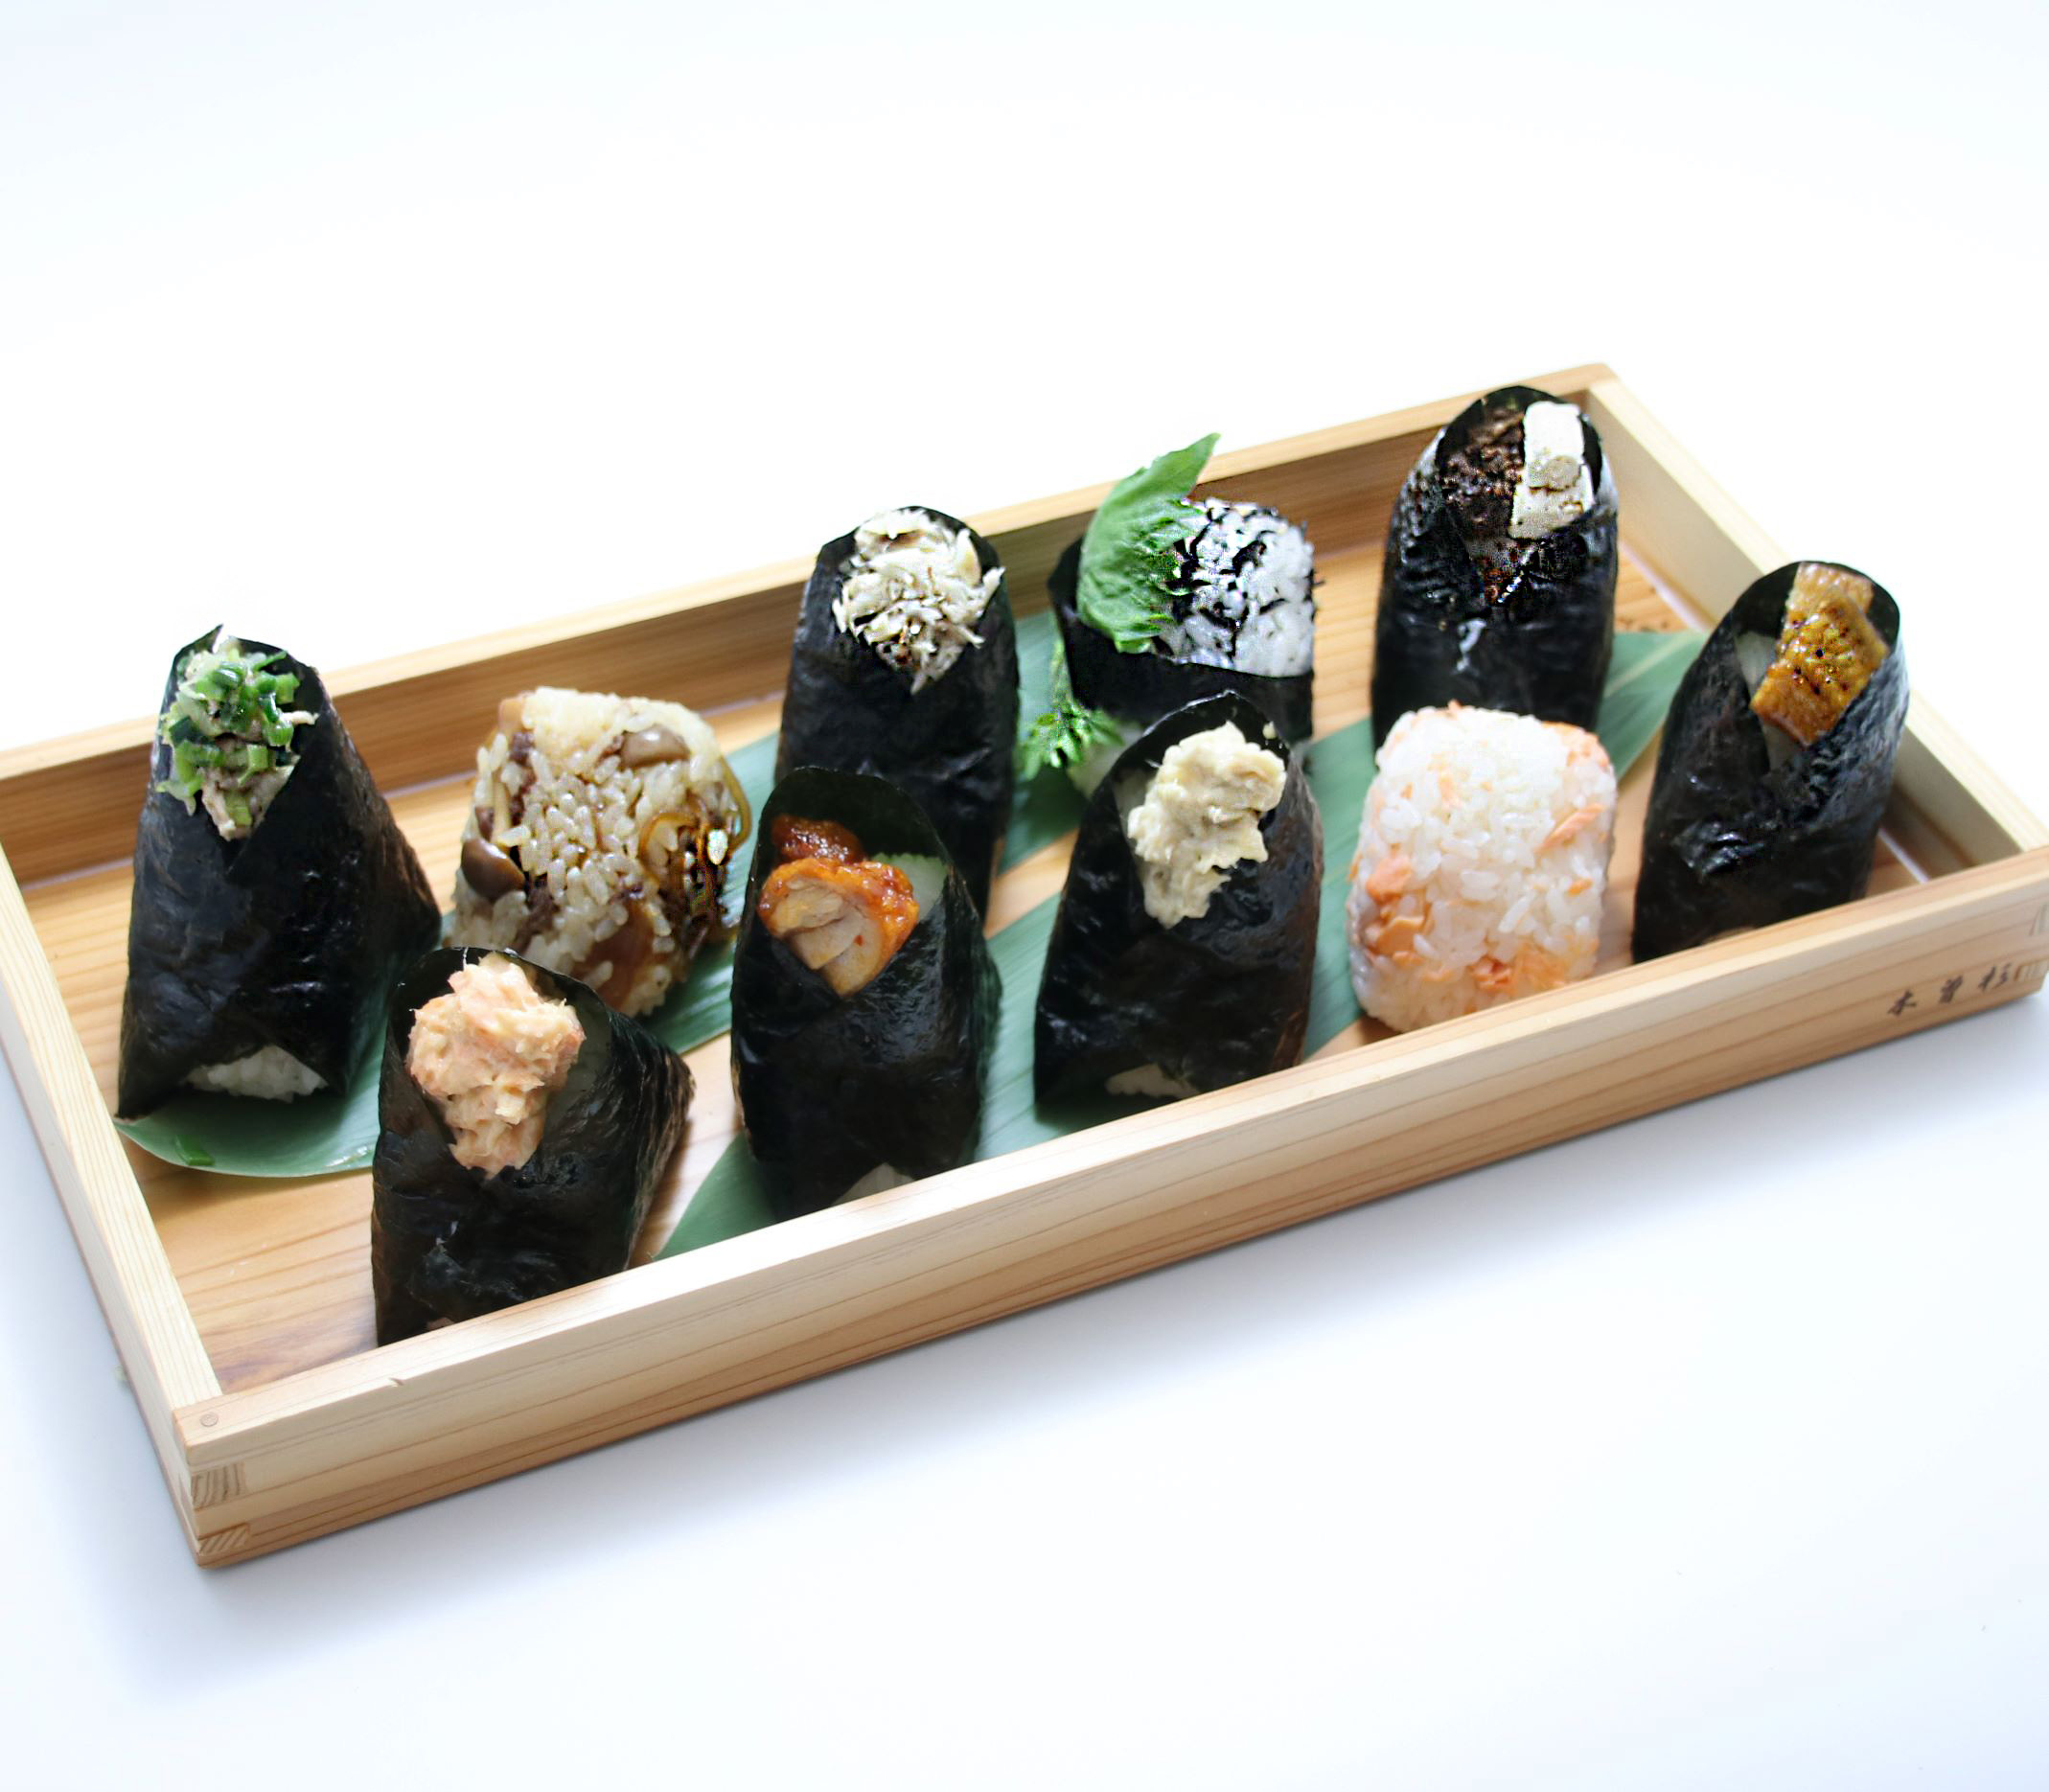 Ootoya onigiri